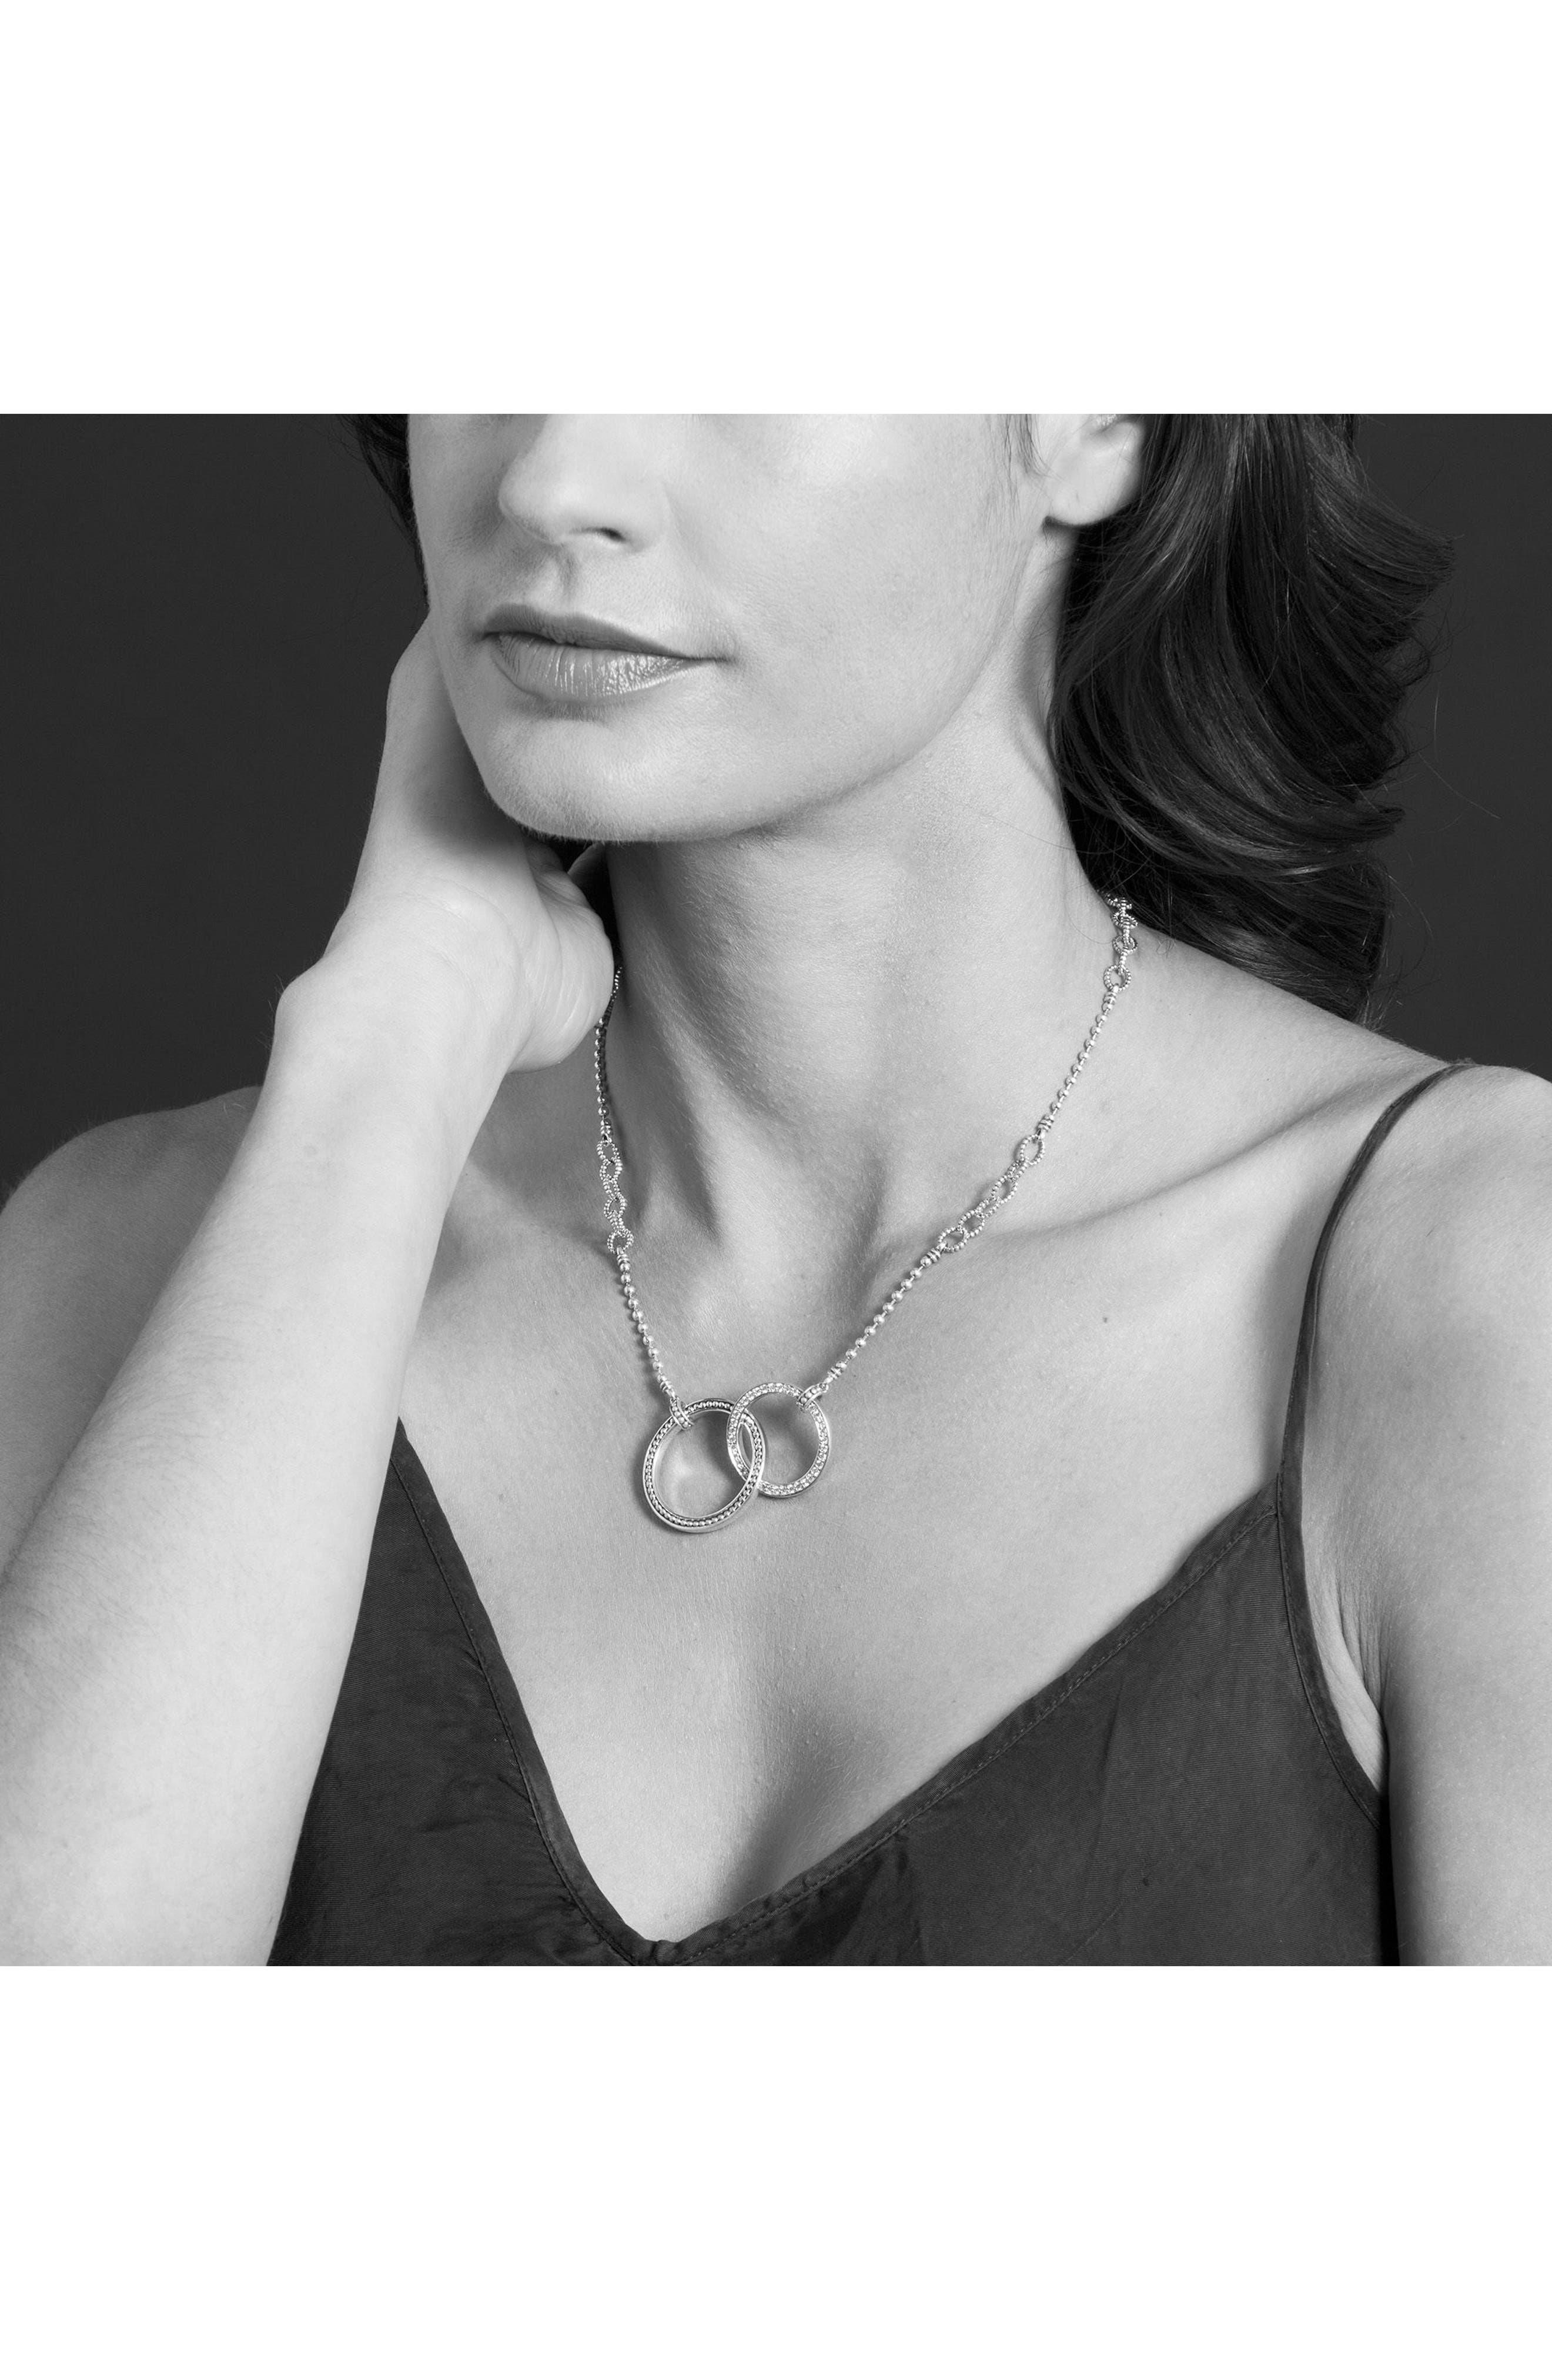 Enso Diamond Pendant Necklace,                             Alternate thumbnail 3, color,                             SILVER